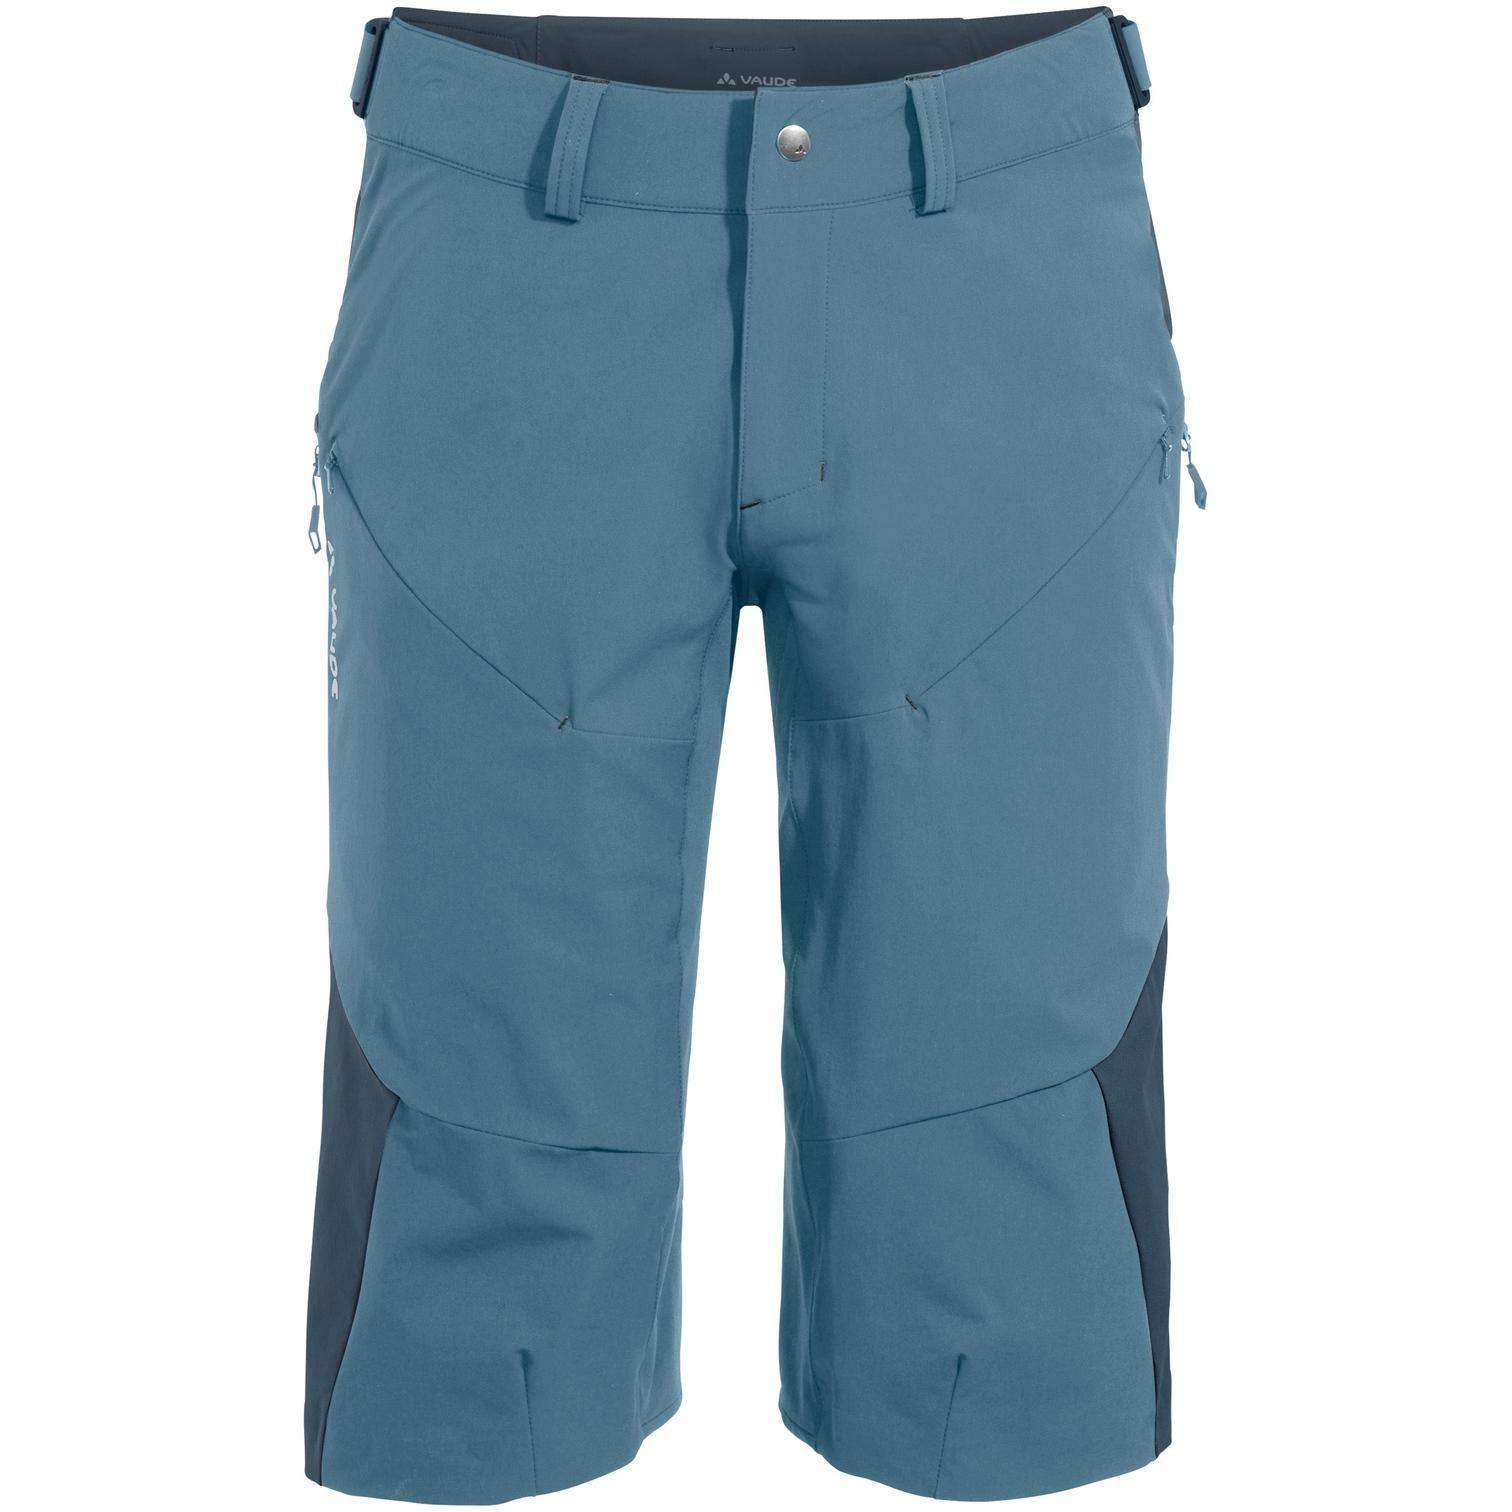 Vaude Moab MTB-Shorts IV - blue gray